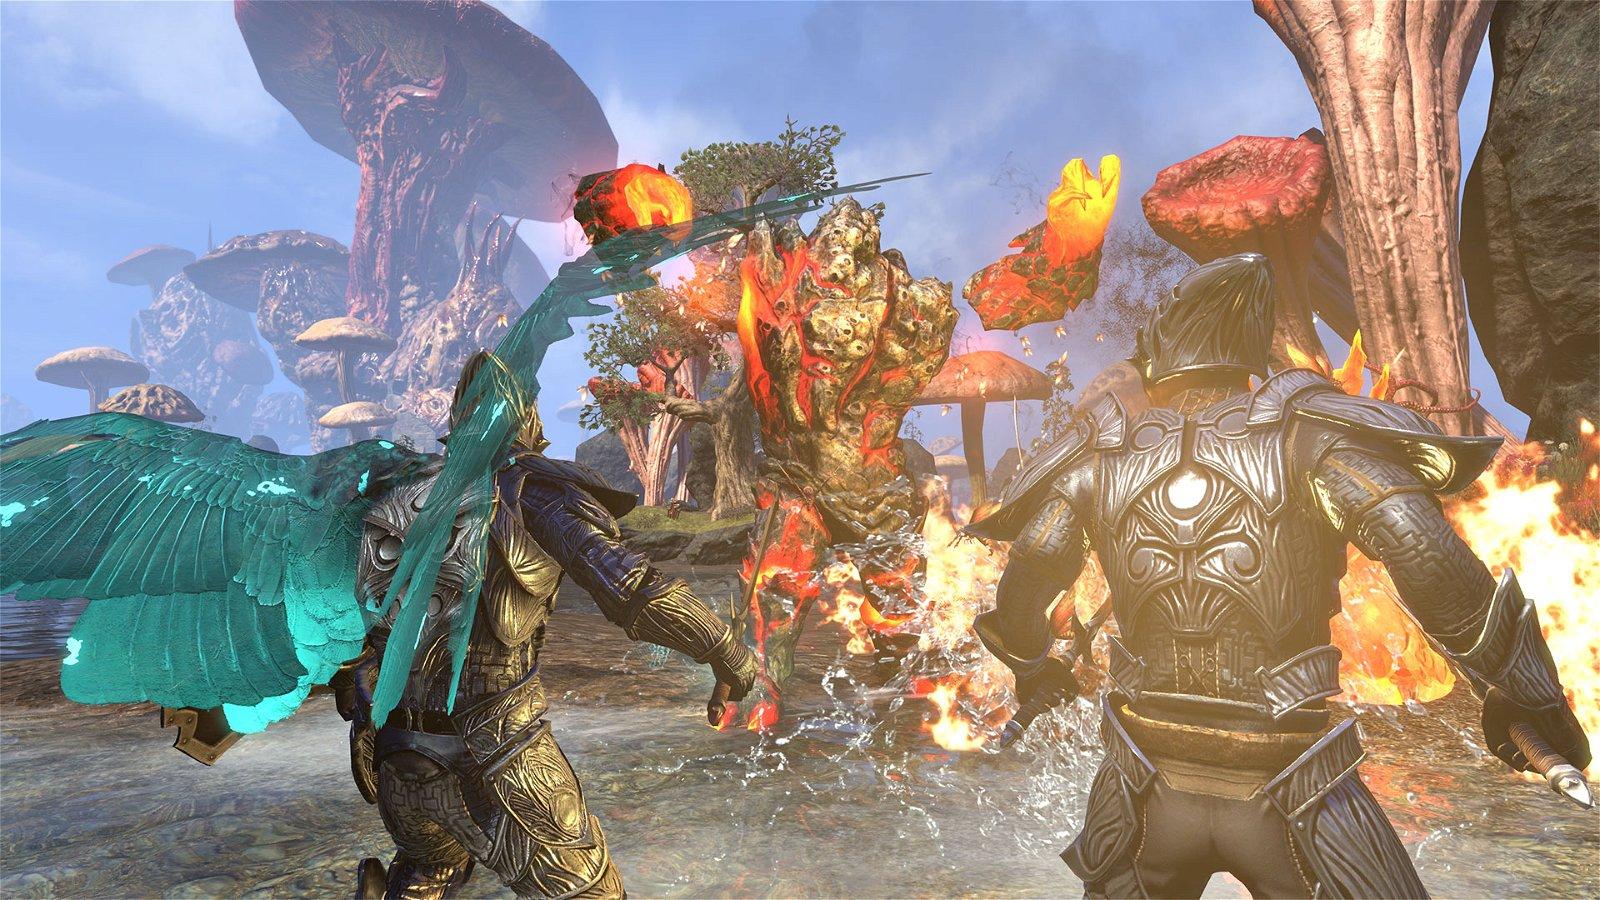 Elder Scrolls Online: Morrowind Review - Going Back In Time 4